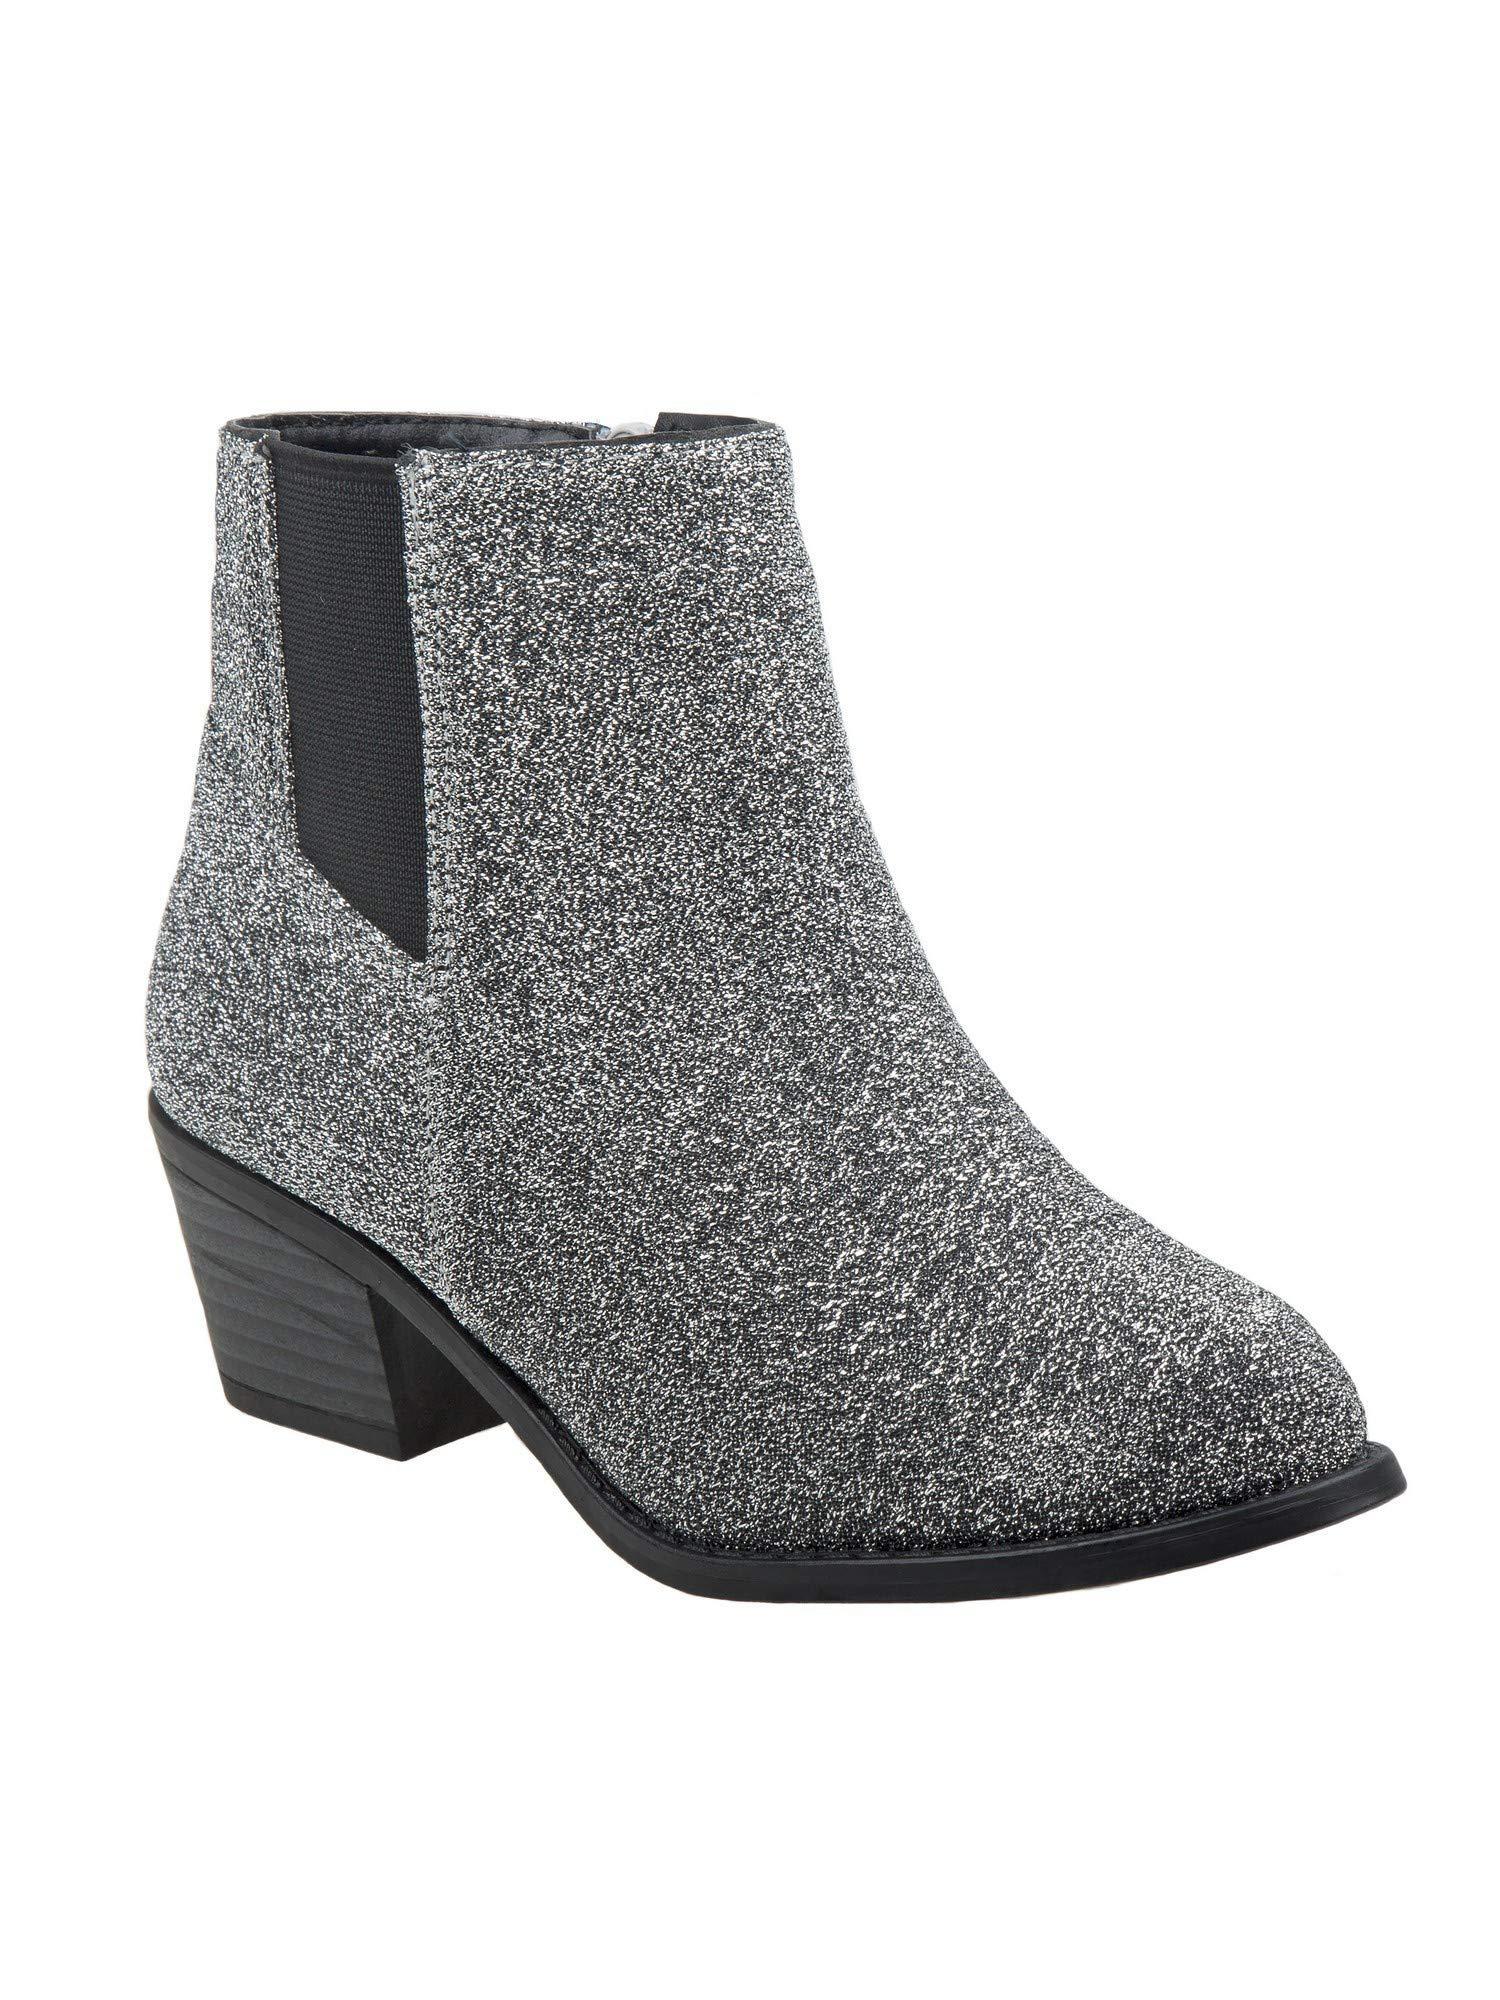 Nanette Lepore Girls Gray Shimmery Texture Side Zip Chelsea Boots 12 Kids